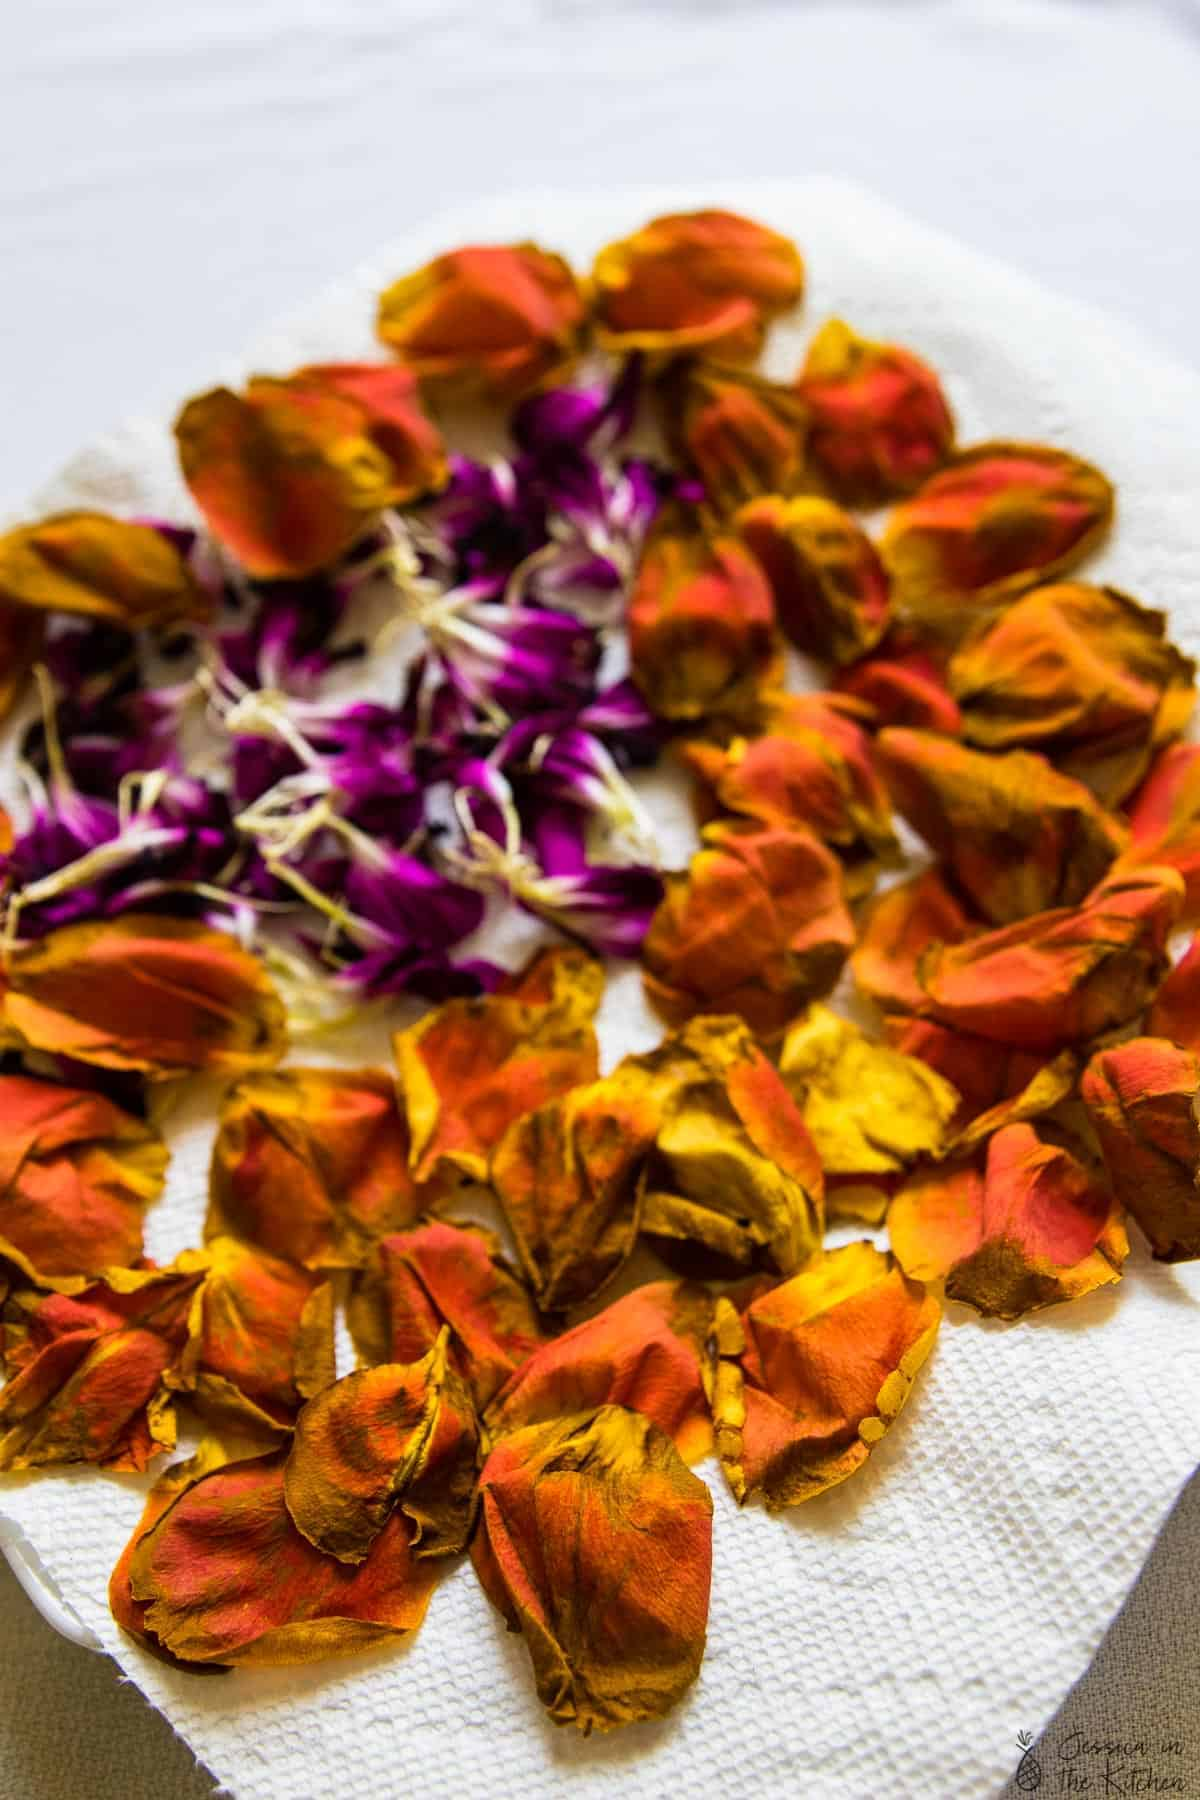 Flour petals on a kitchen towel.